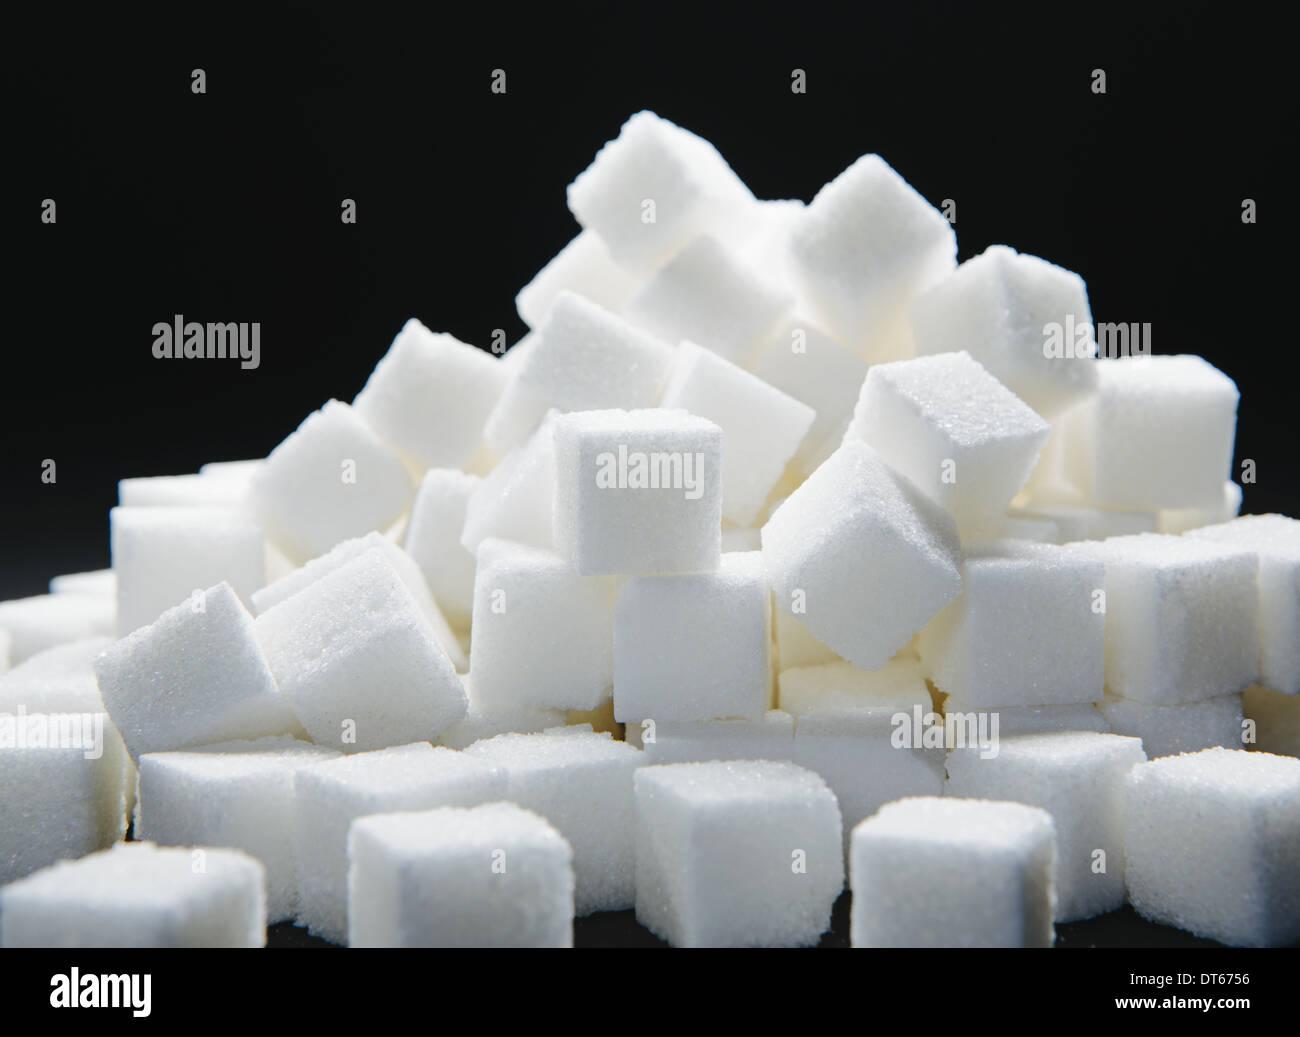 Pile of sugar cubes, black backdrop - Stock Image